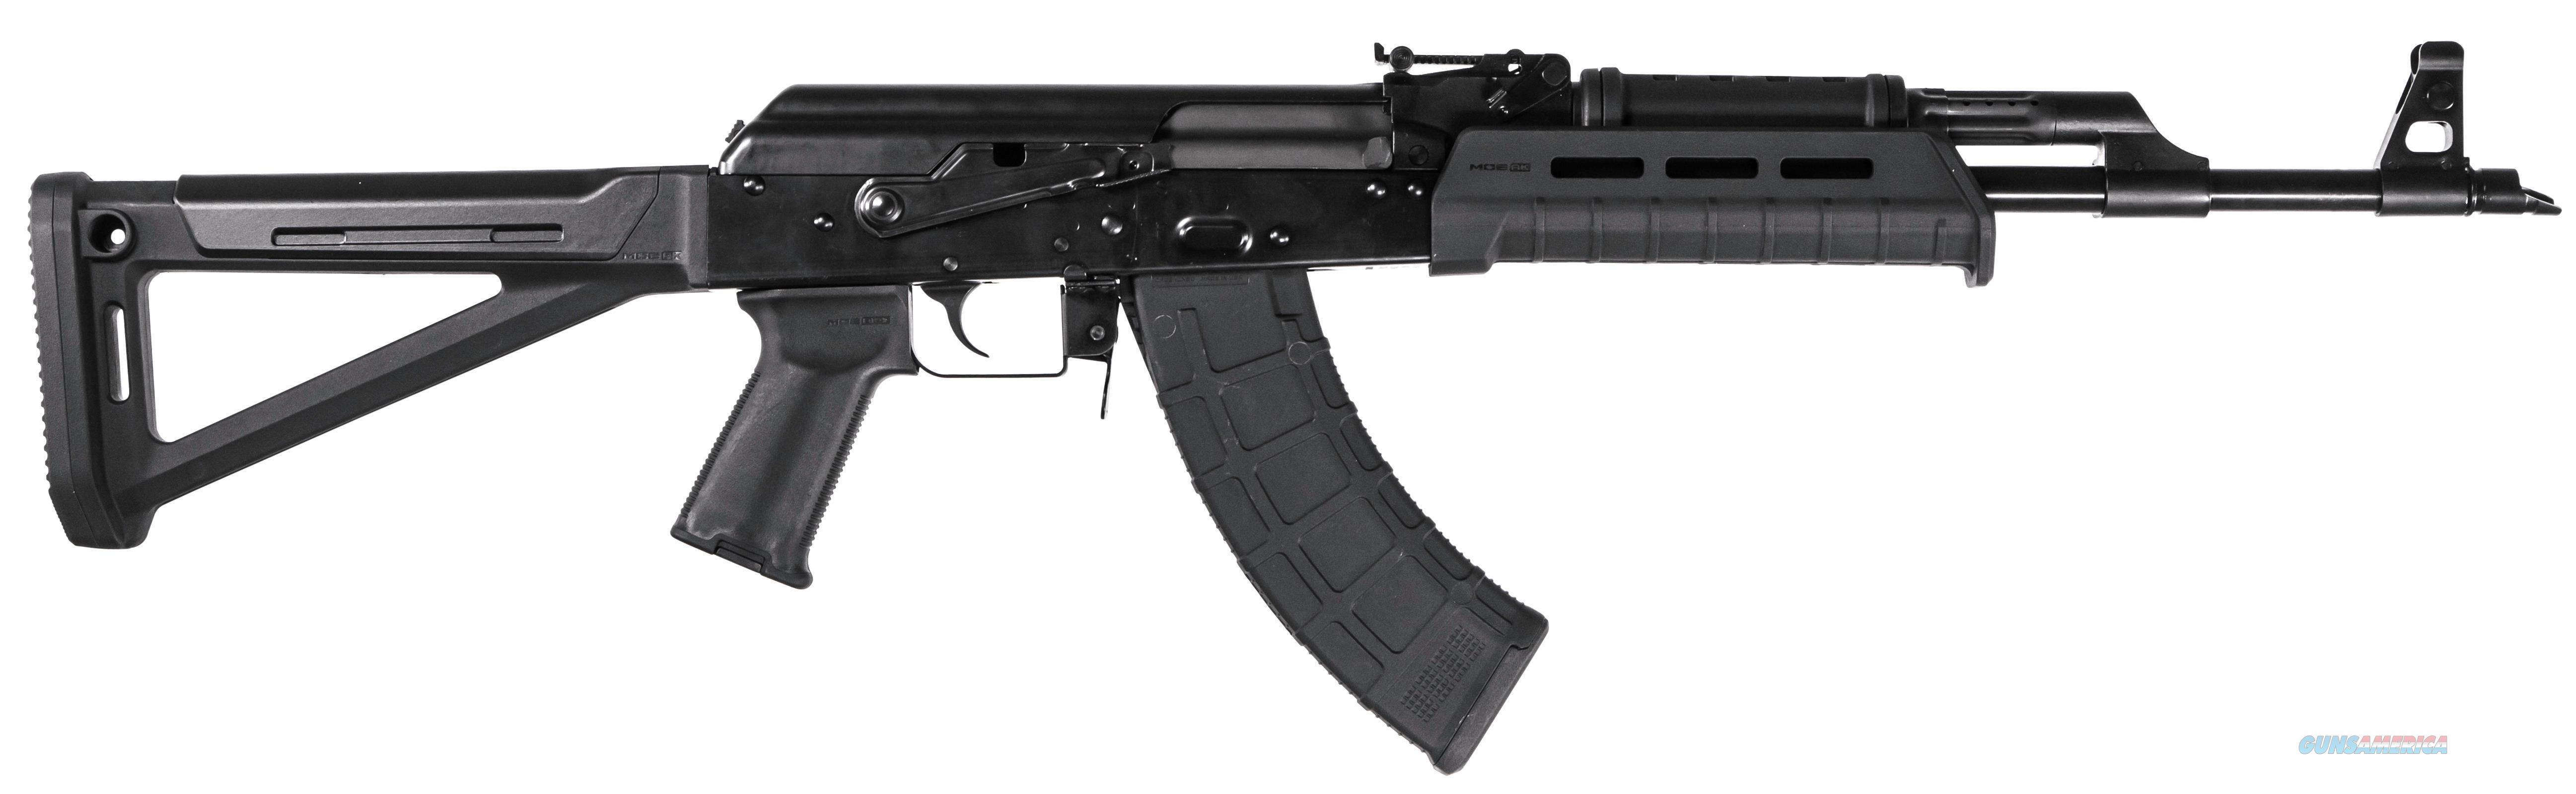 "Century Ri2399n C39 V2 Magpul Moe Semi-Automatic 7.62X39mm 16.5"" 30+1 Magpul Moe Stk Blk Nitride RI2360-N  Guns > Rifles > C Misc Rifles"